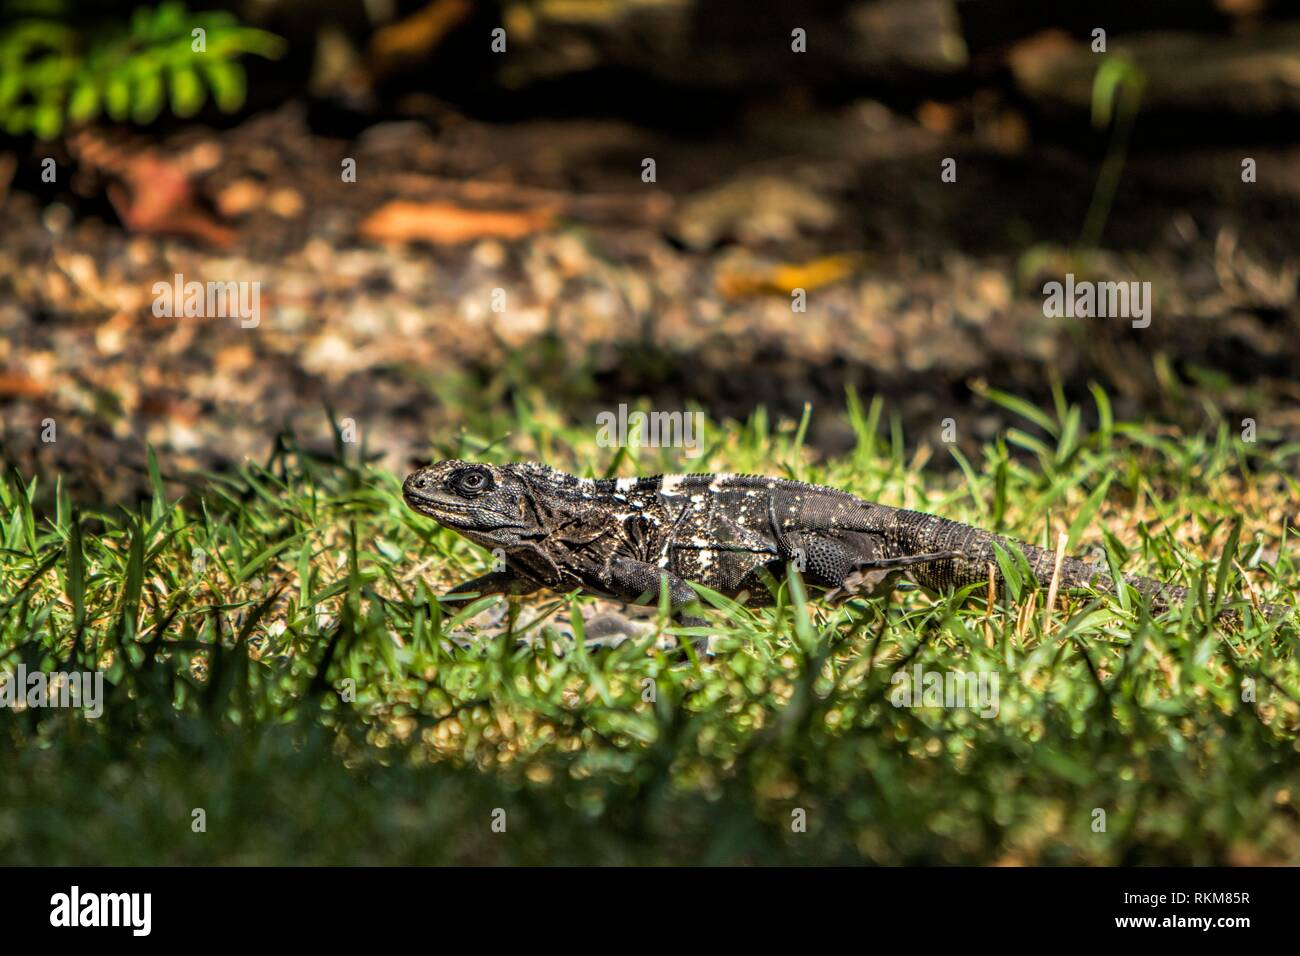 Roat n Spiny-tailed Iguanas (Ctenosaura oedirhina). Gumbalimba Park. Roatan. Honduras. - Stock Image